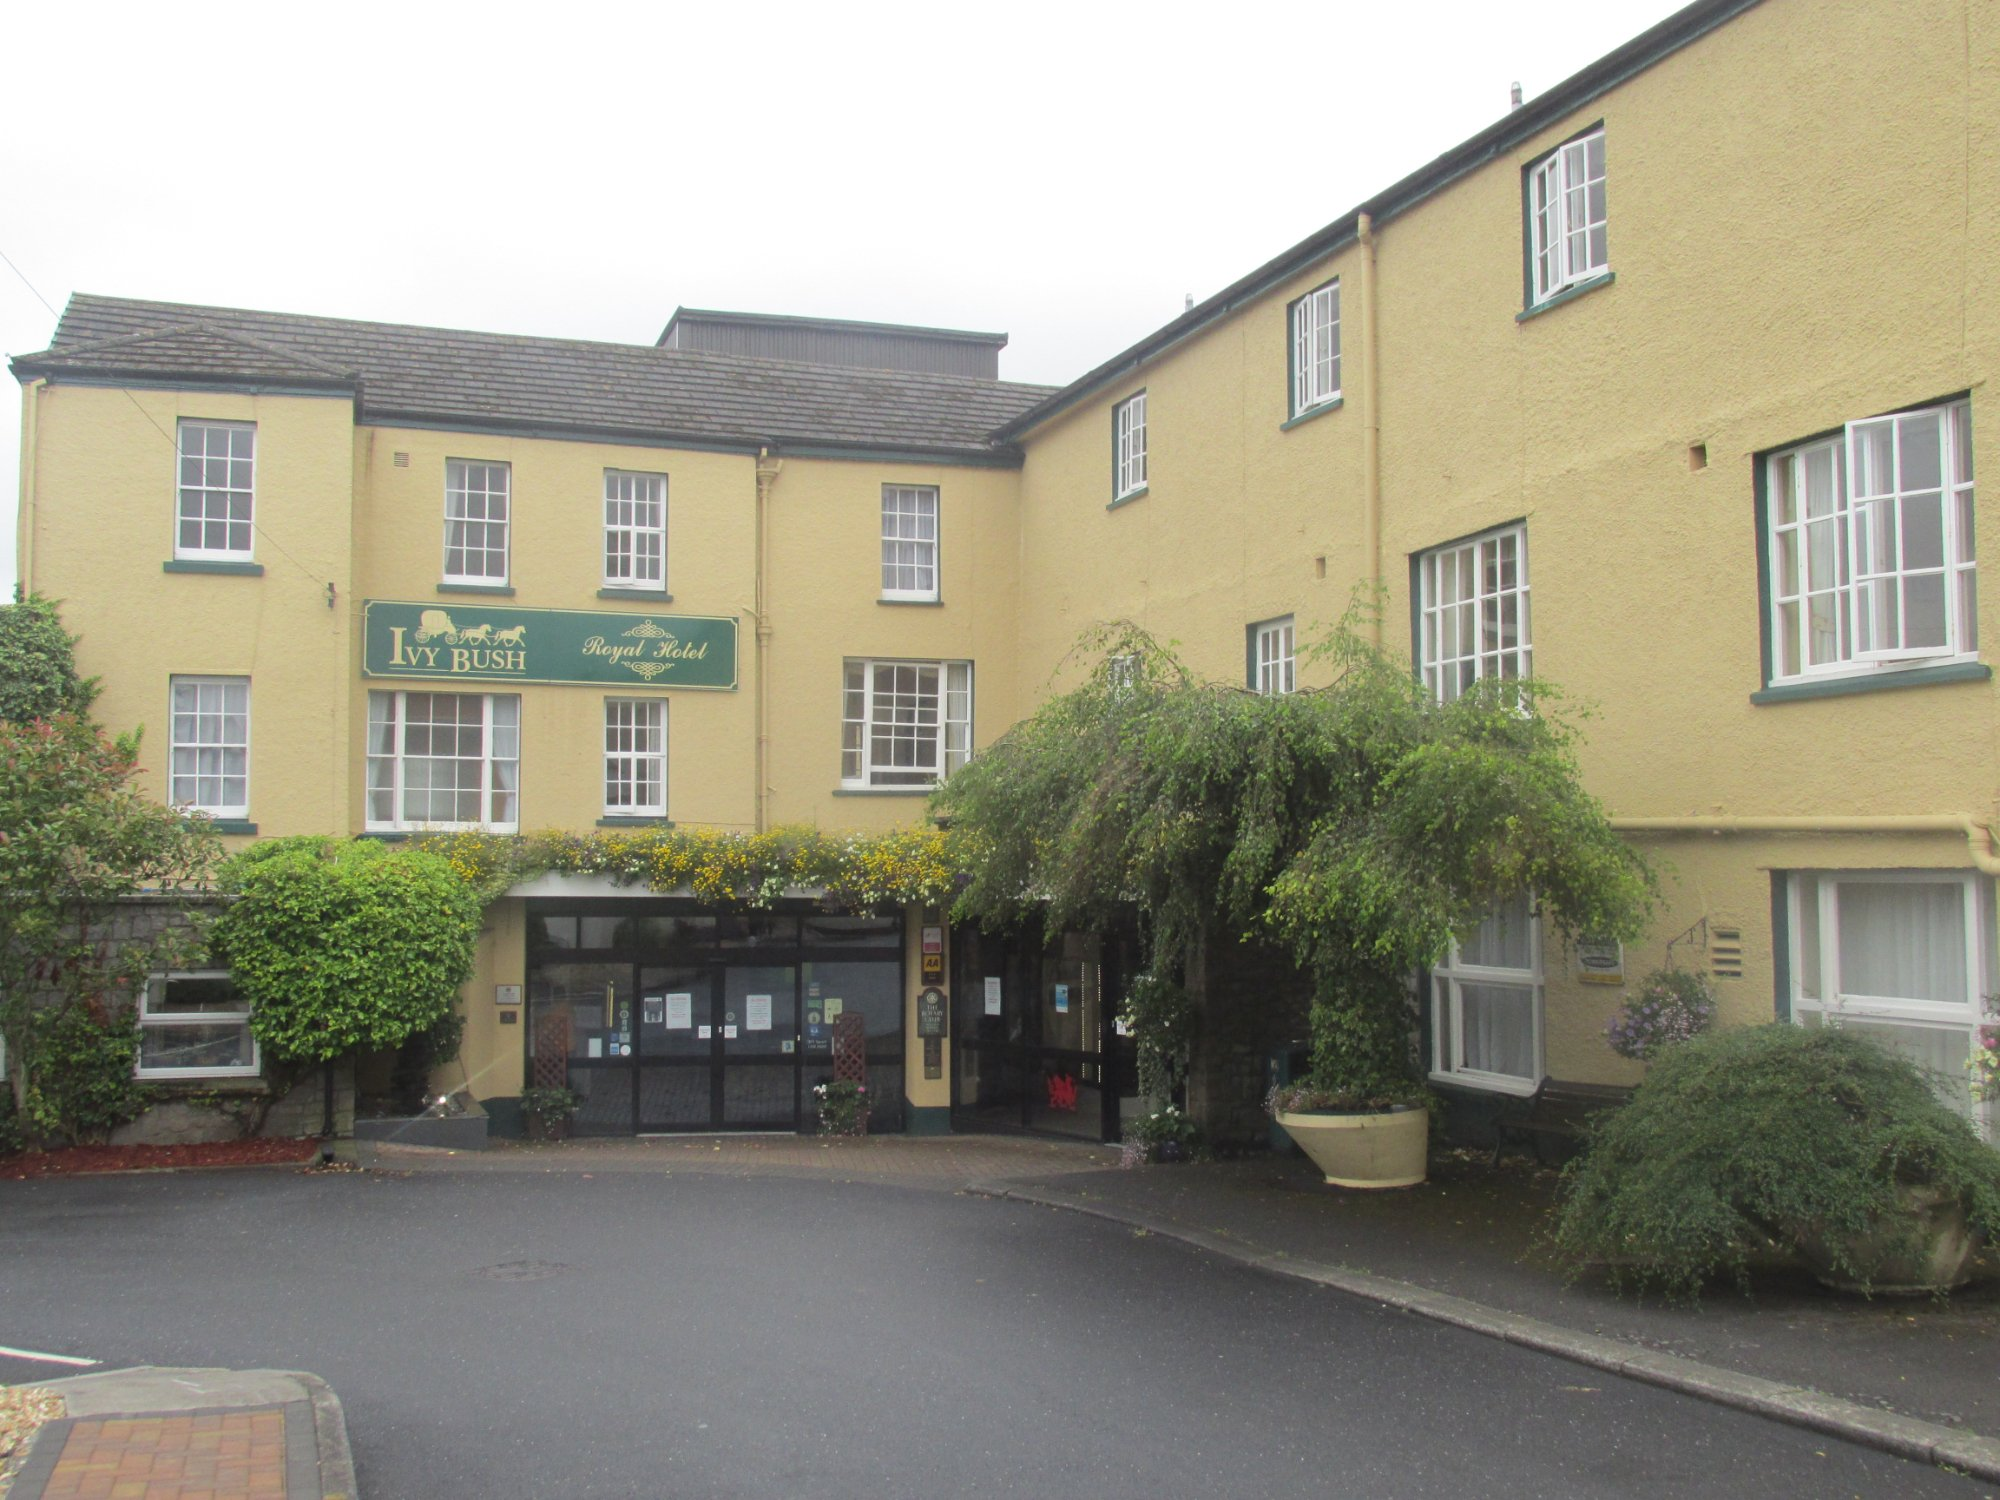 The Ivy Bush Royal Hotel